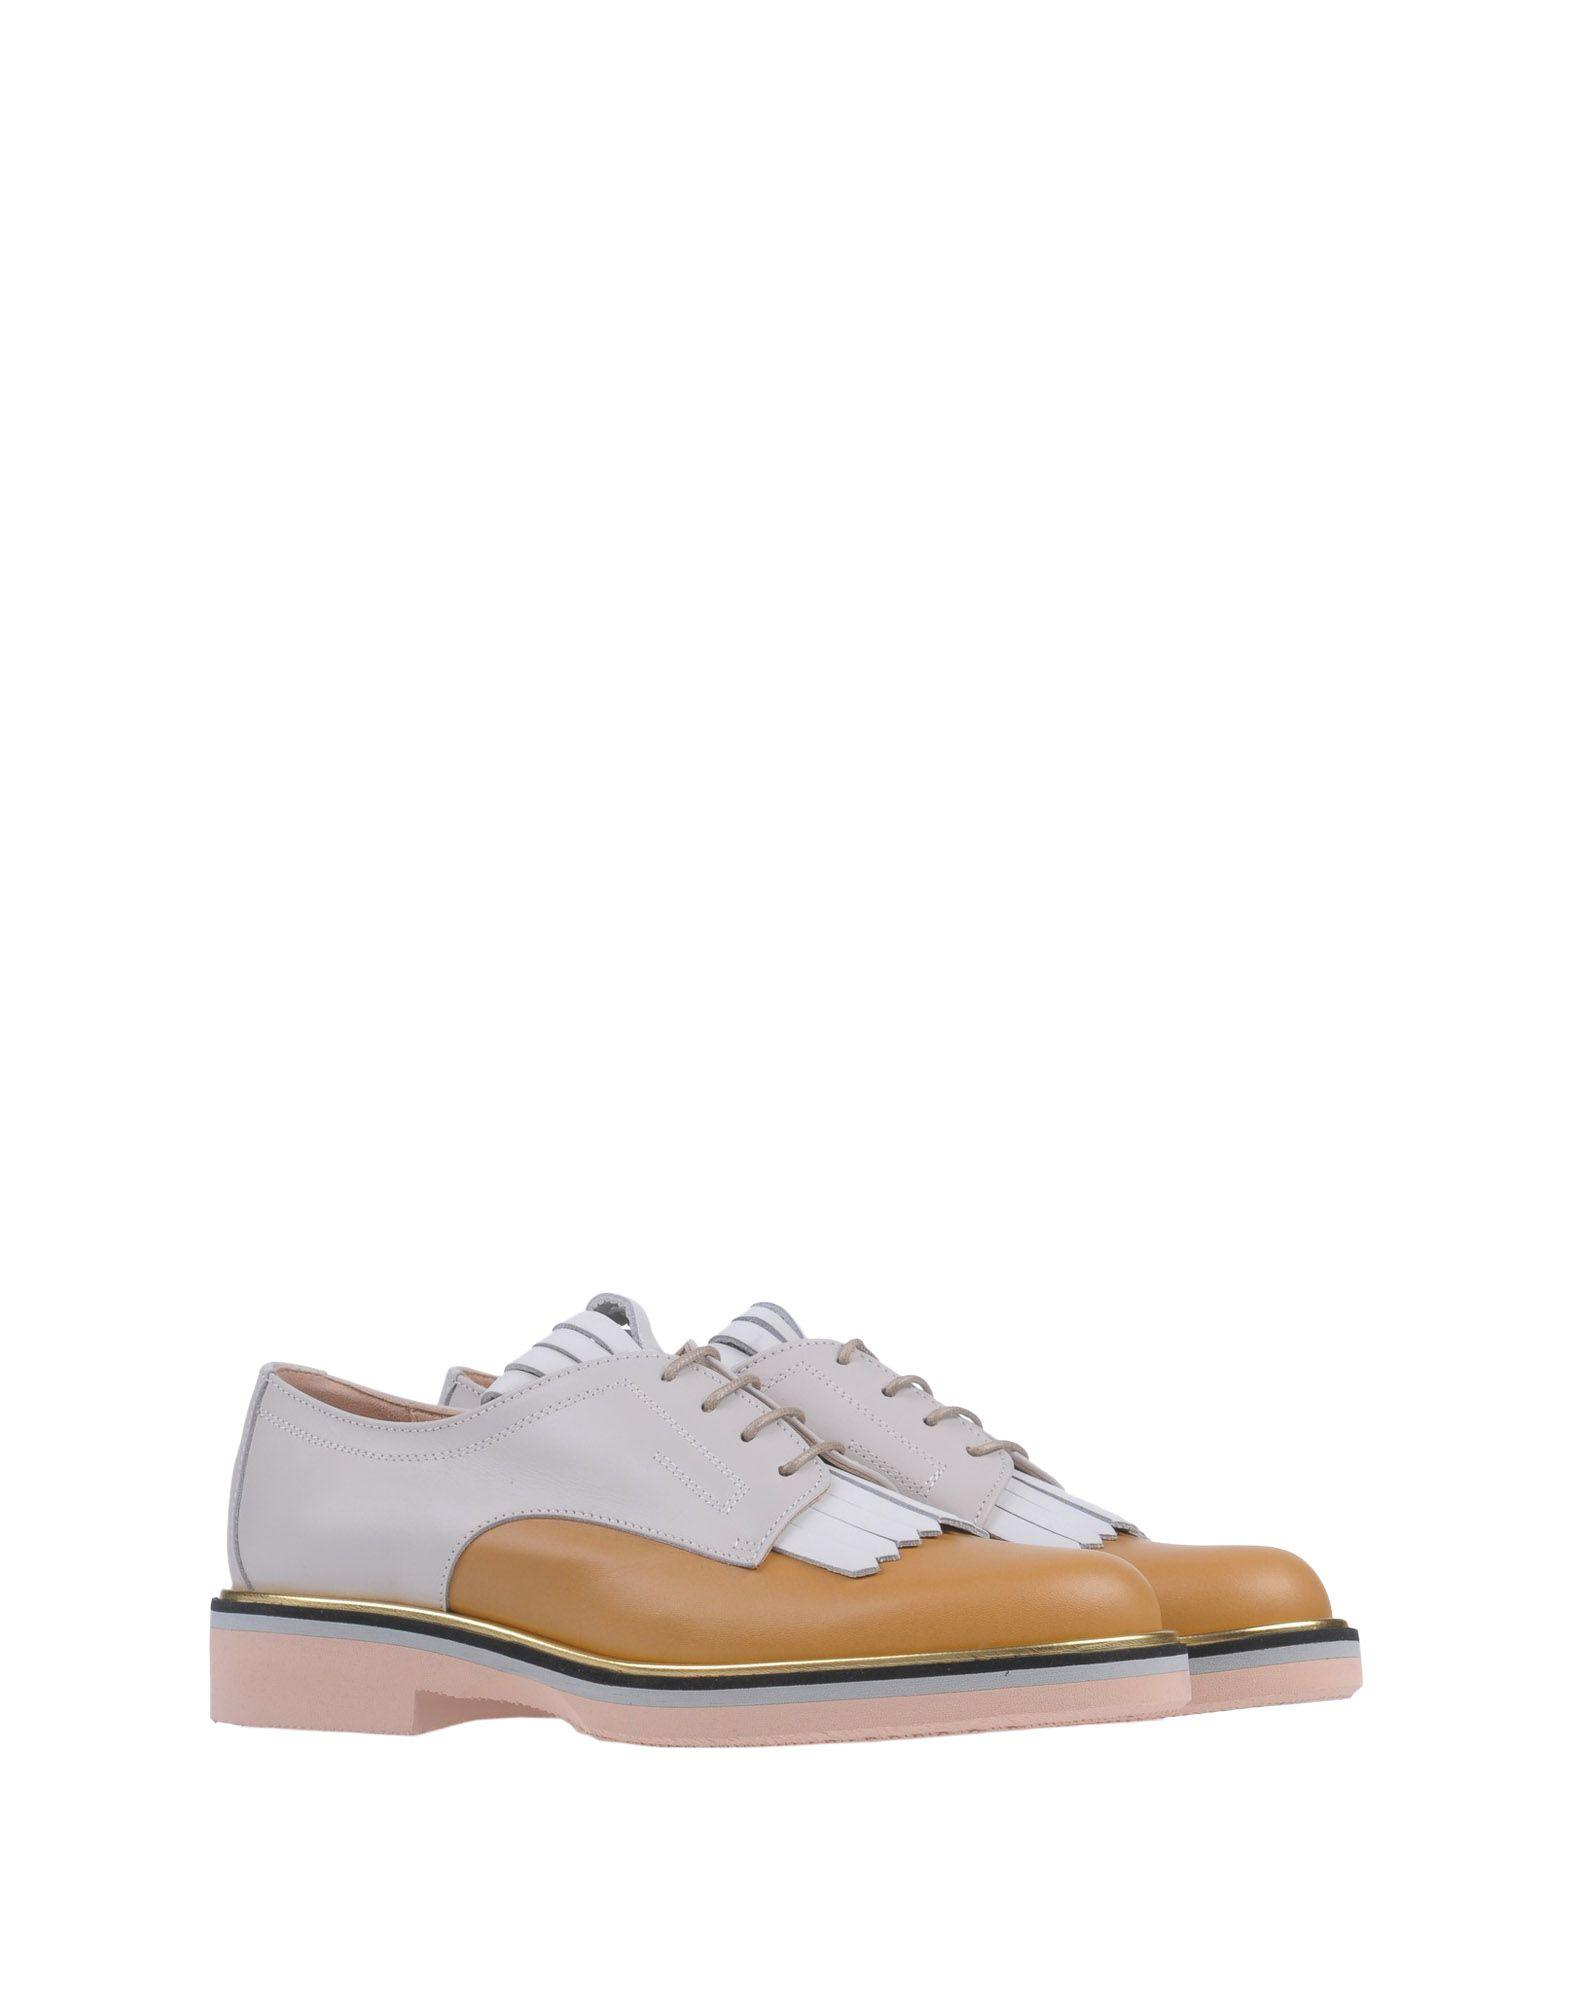 Stilvolle billige Schnürschuhe Schuhe Pollini Schnürschuhe billige Damen  11331403IL a588a0